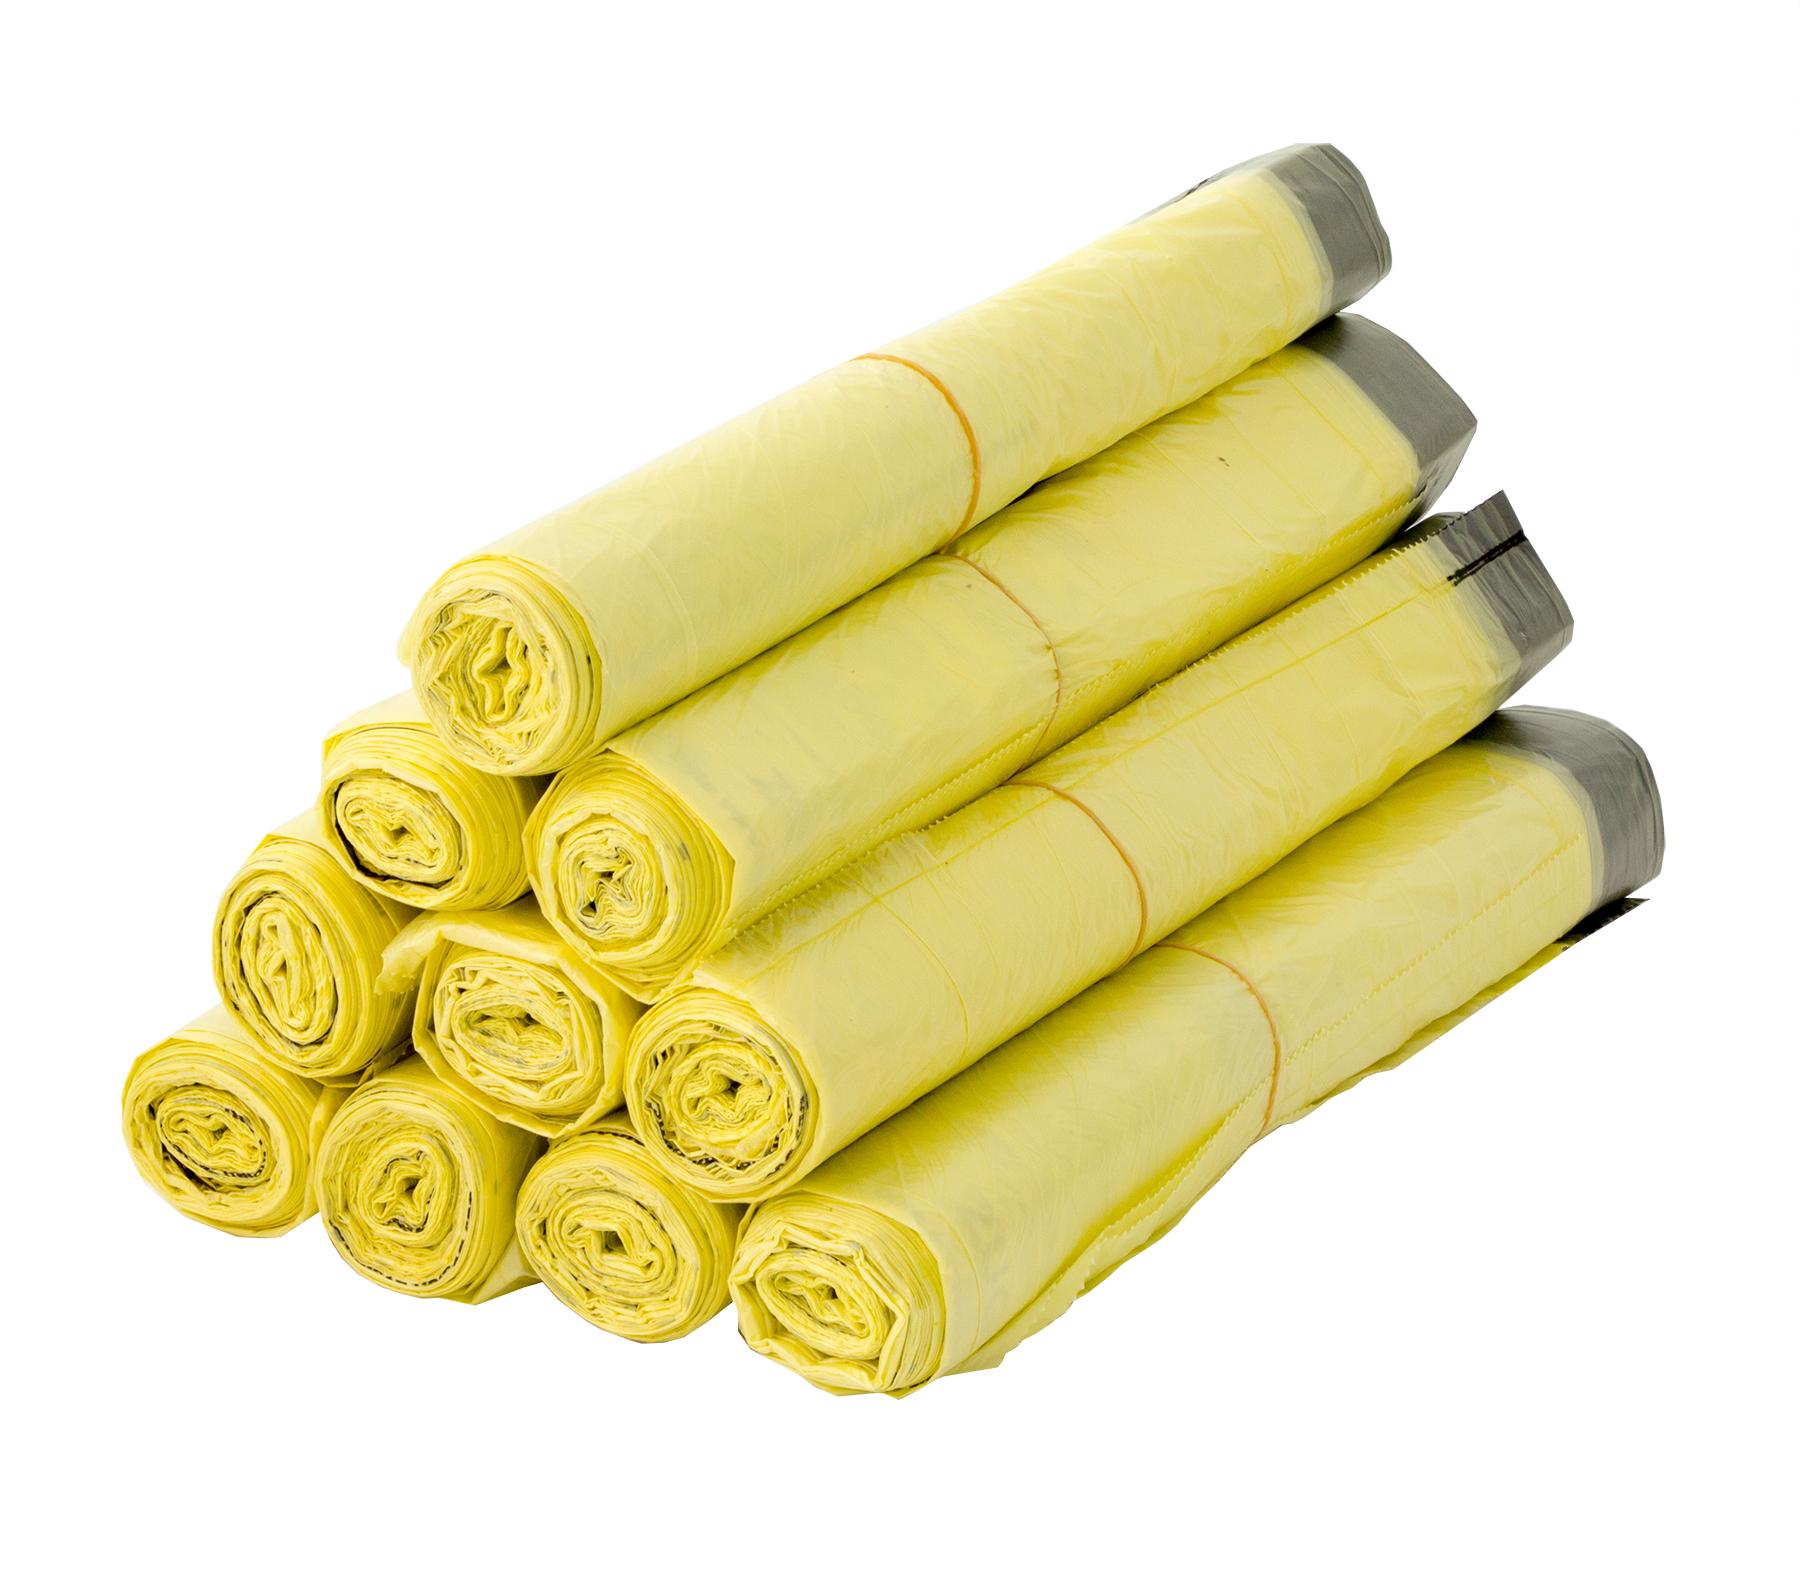 Recycling-Müllsack Grüner Punkt Mülltüten der gelbe Müllsack 60 L Gelber Sack